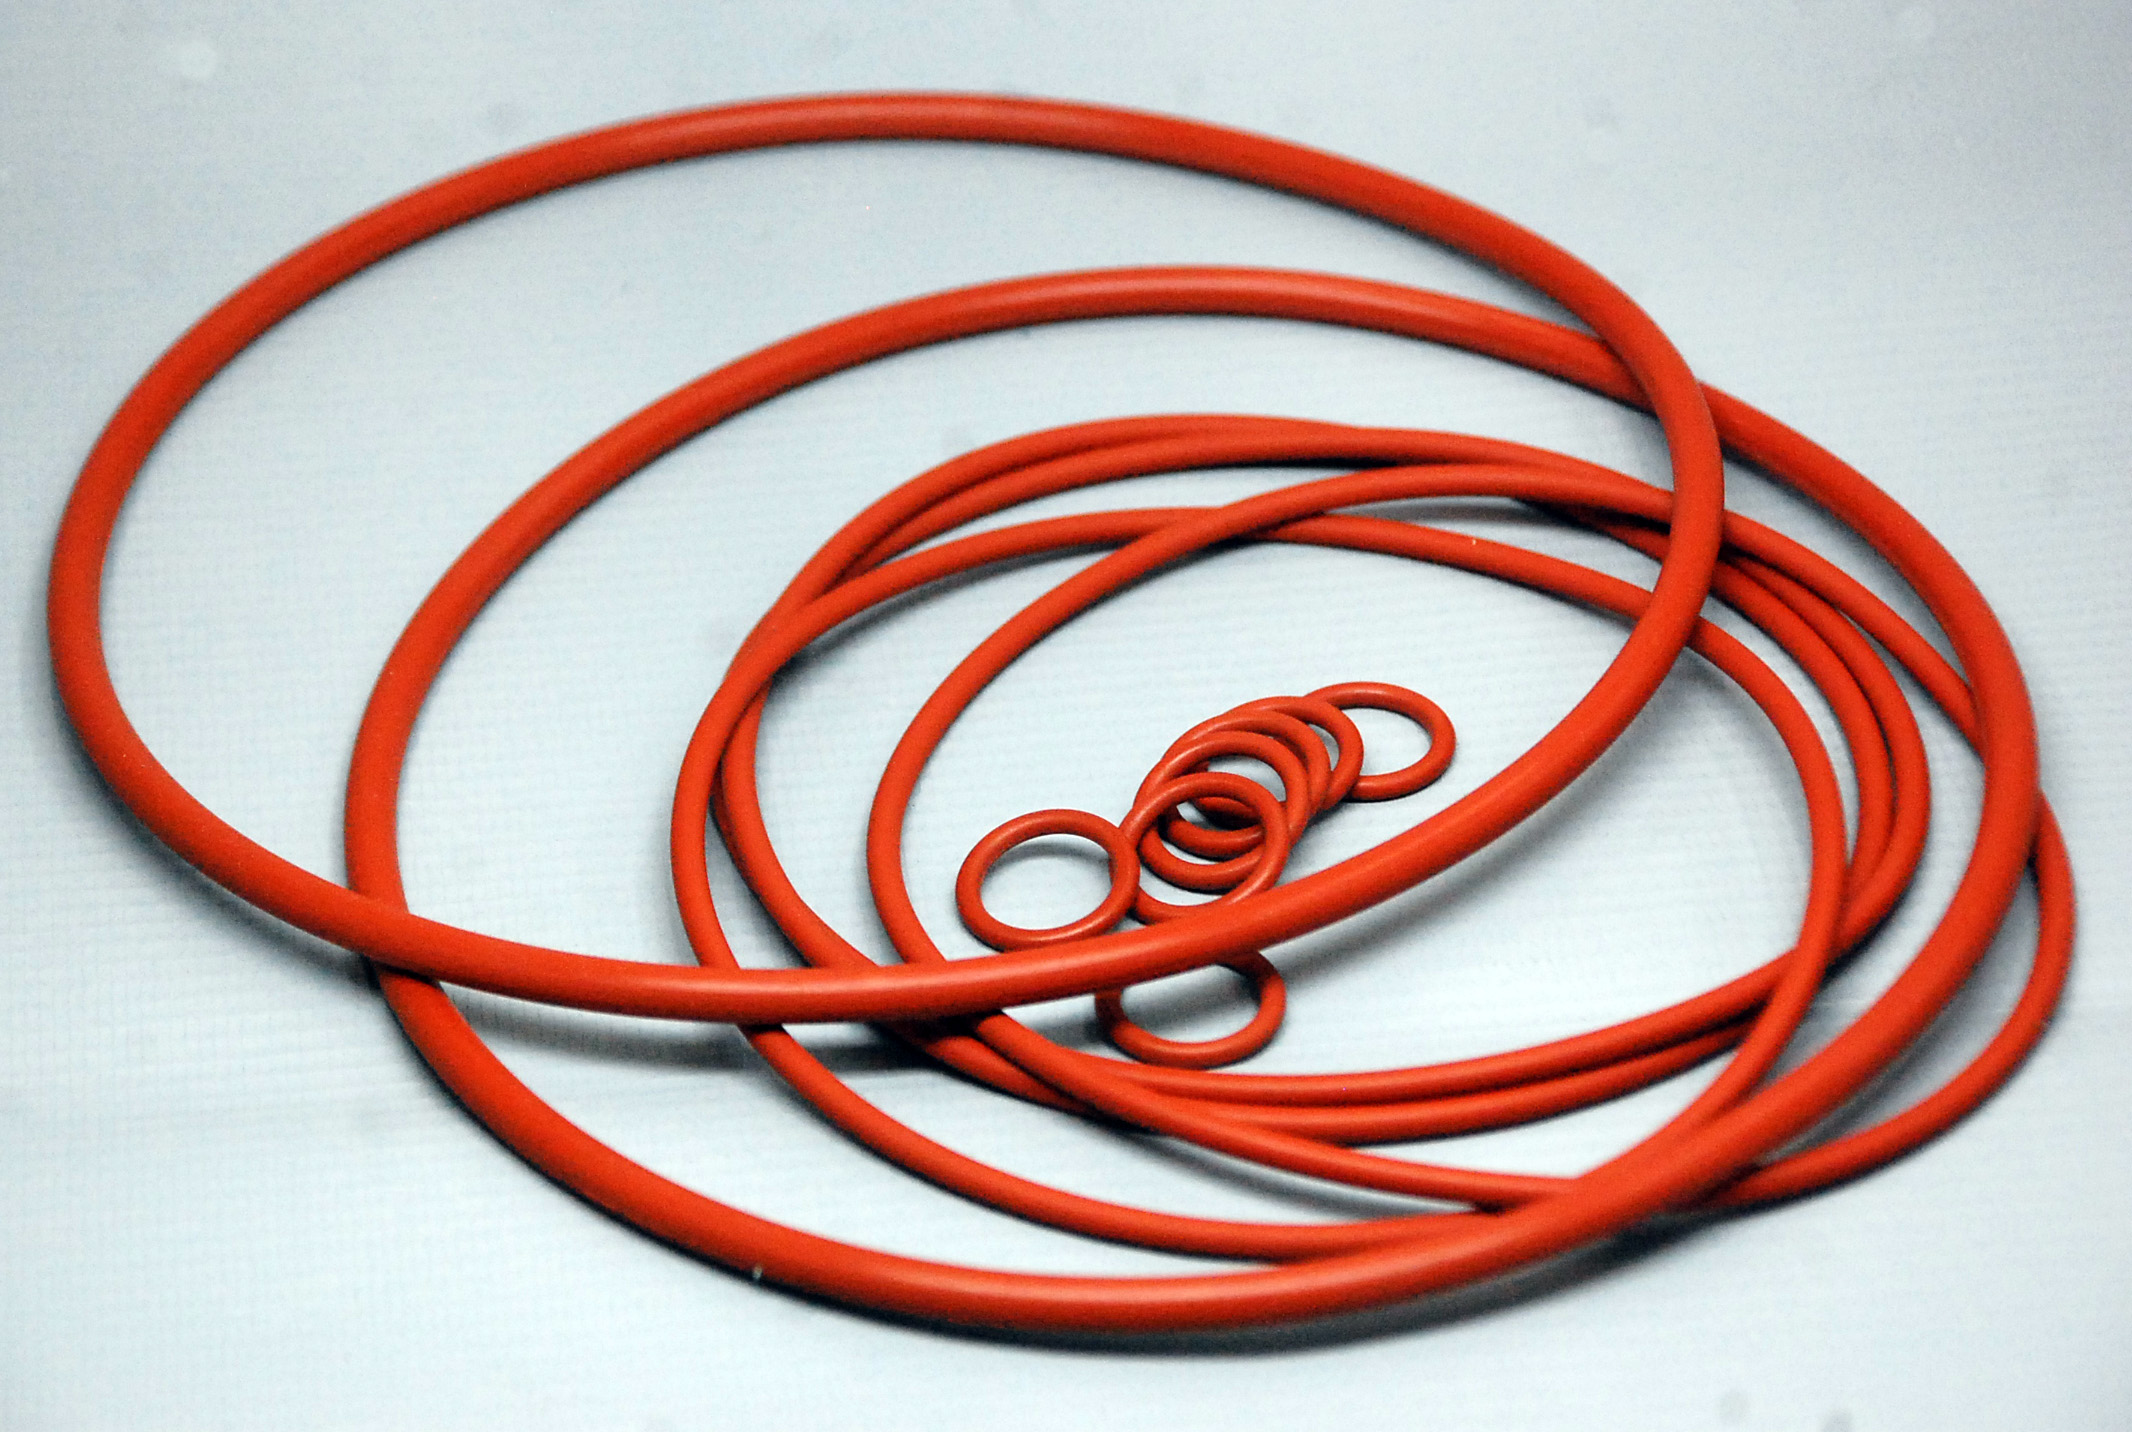 Anéis O-Rings